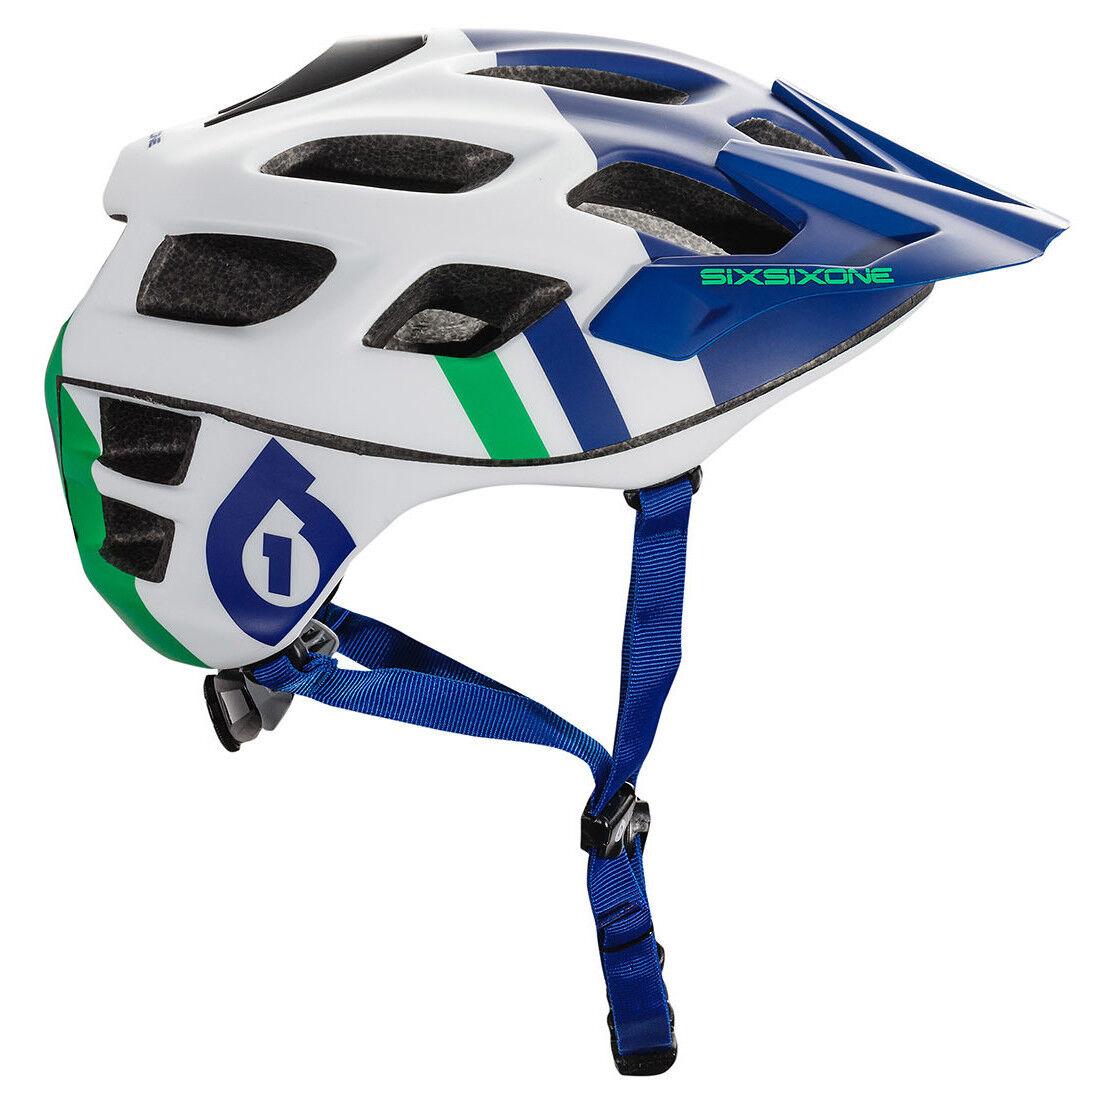 661 Sixsixone Recon MTB Mountain Bike Casco da Bicicletta  Bluverde